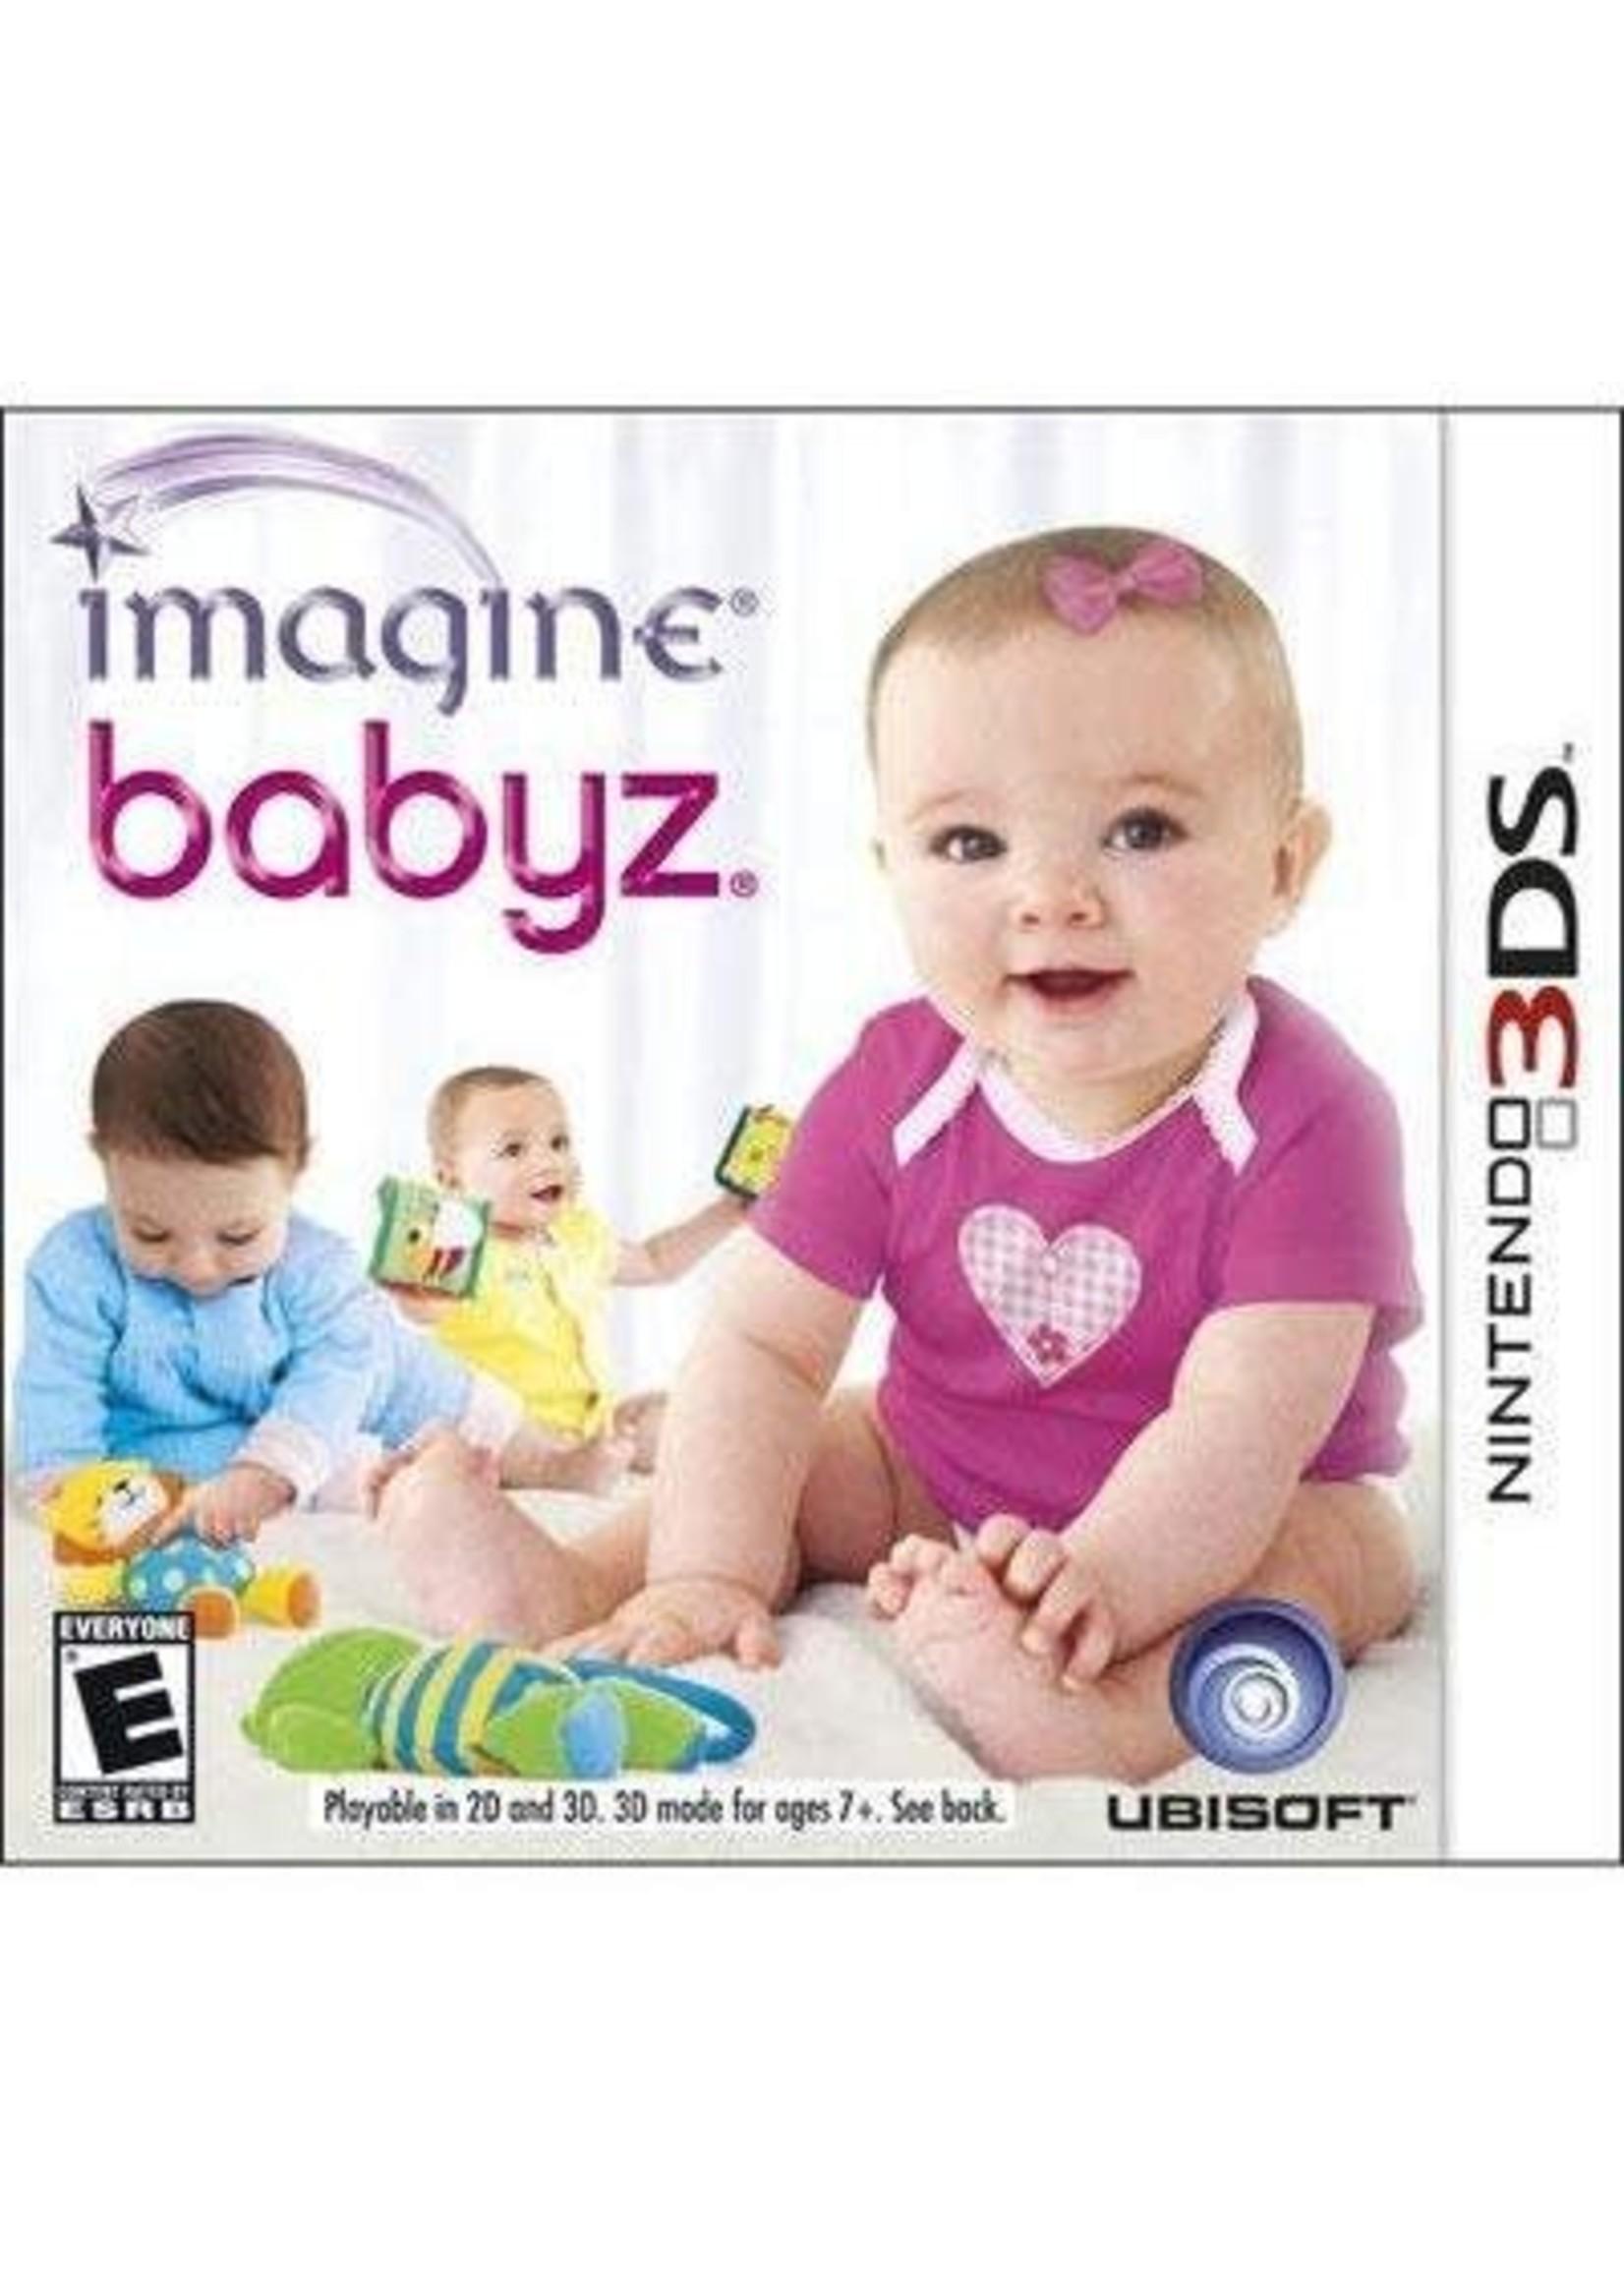 Imagine: Babies - NDS PrePlayed